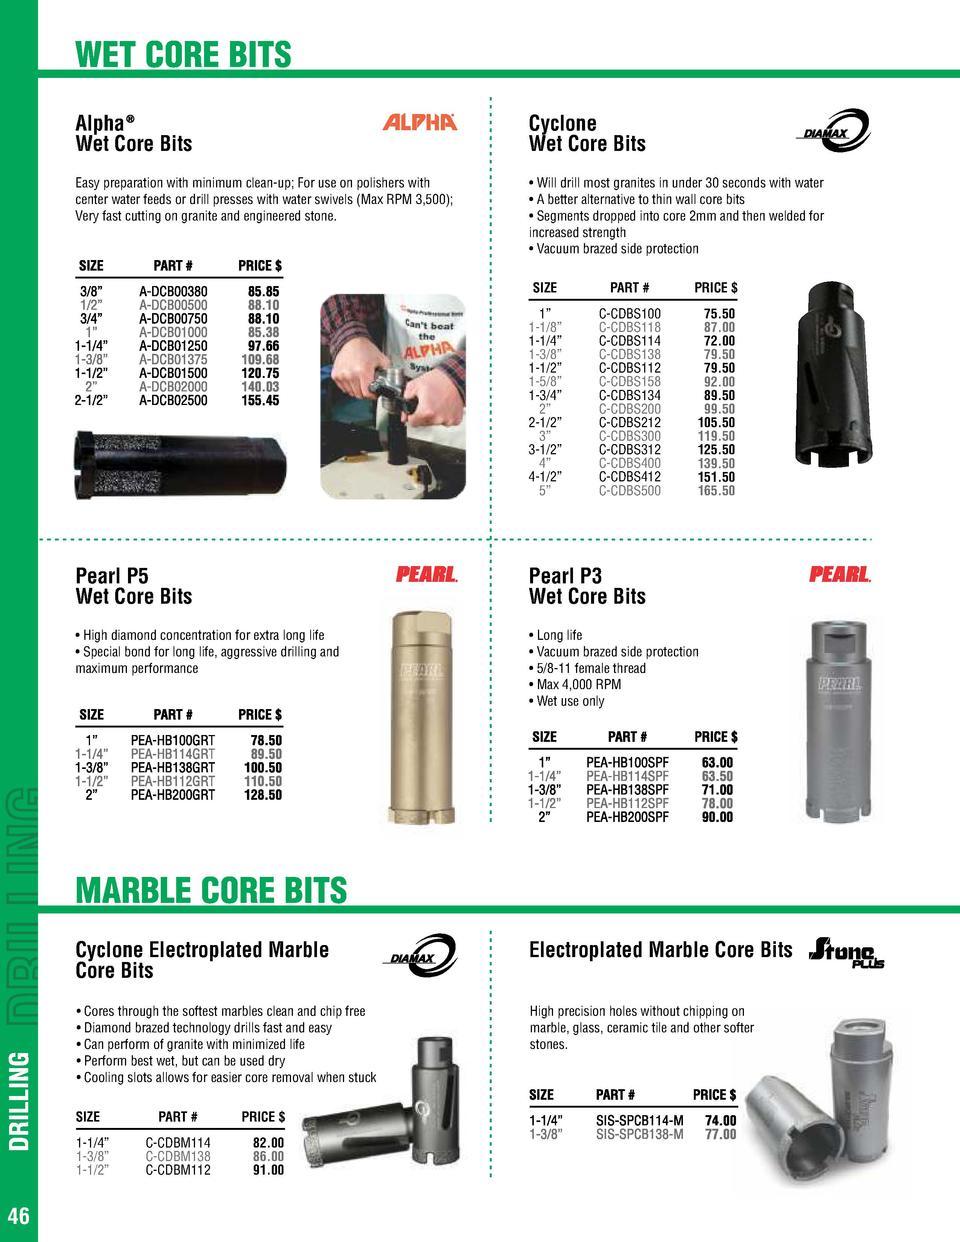 Nano HS Dry Stone Core Bit 1 1//4 Inch